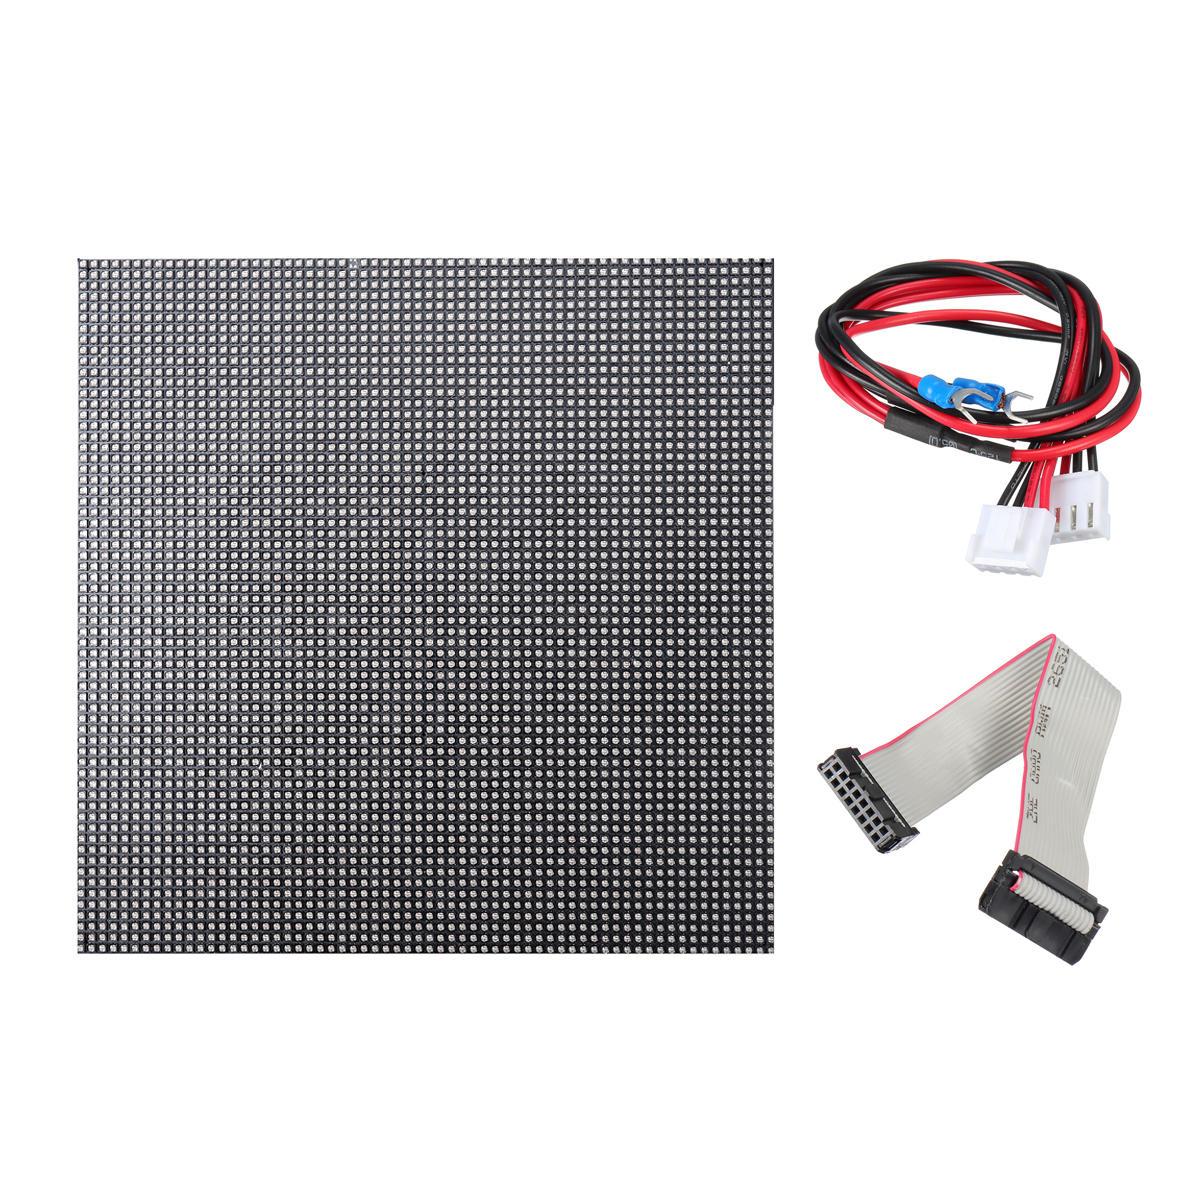 P2.5 LED Display HD Full Color Screen 5V 160*160 LED Display Module Horizontal Scrolling Electronic Screen